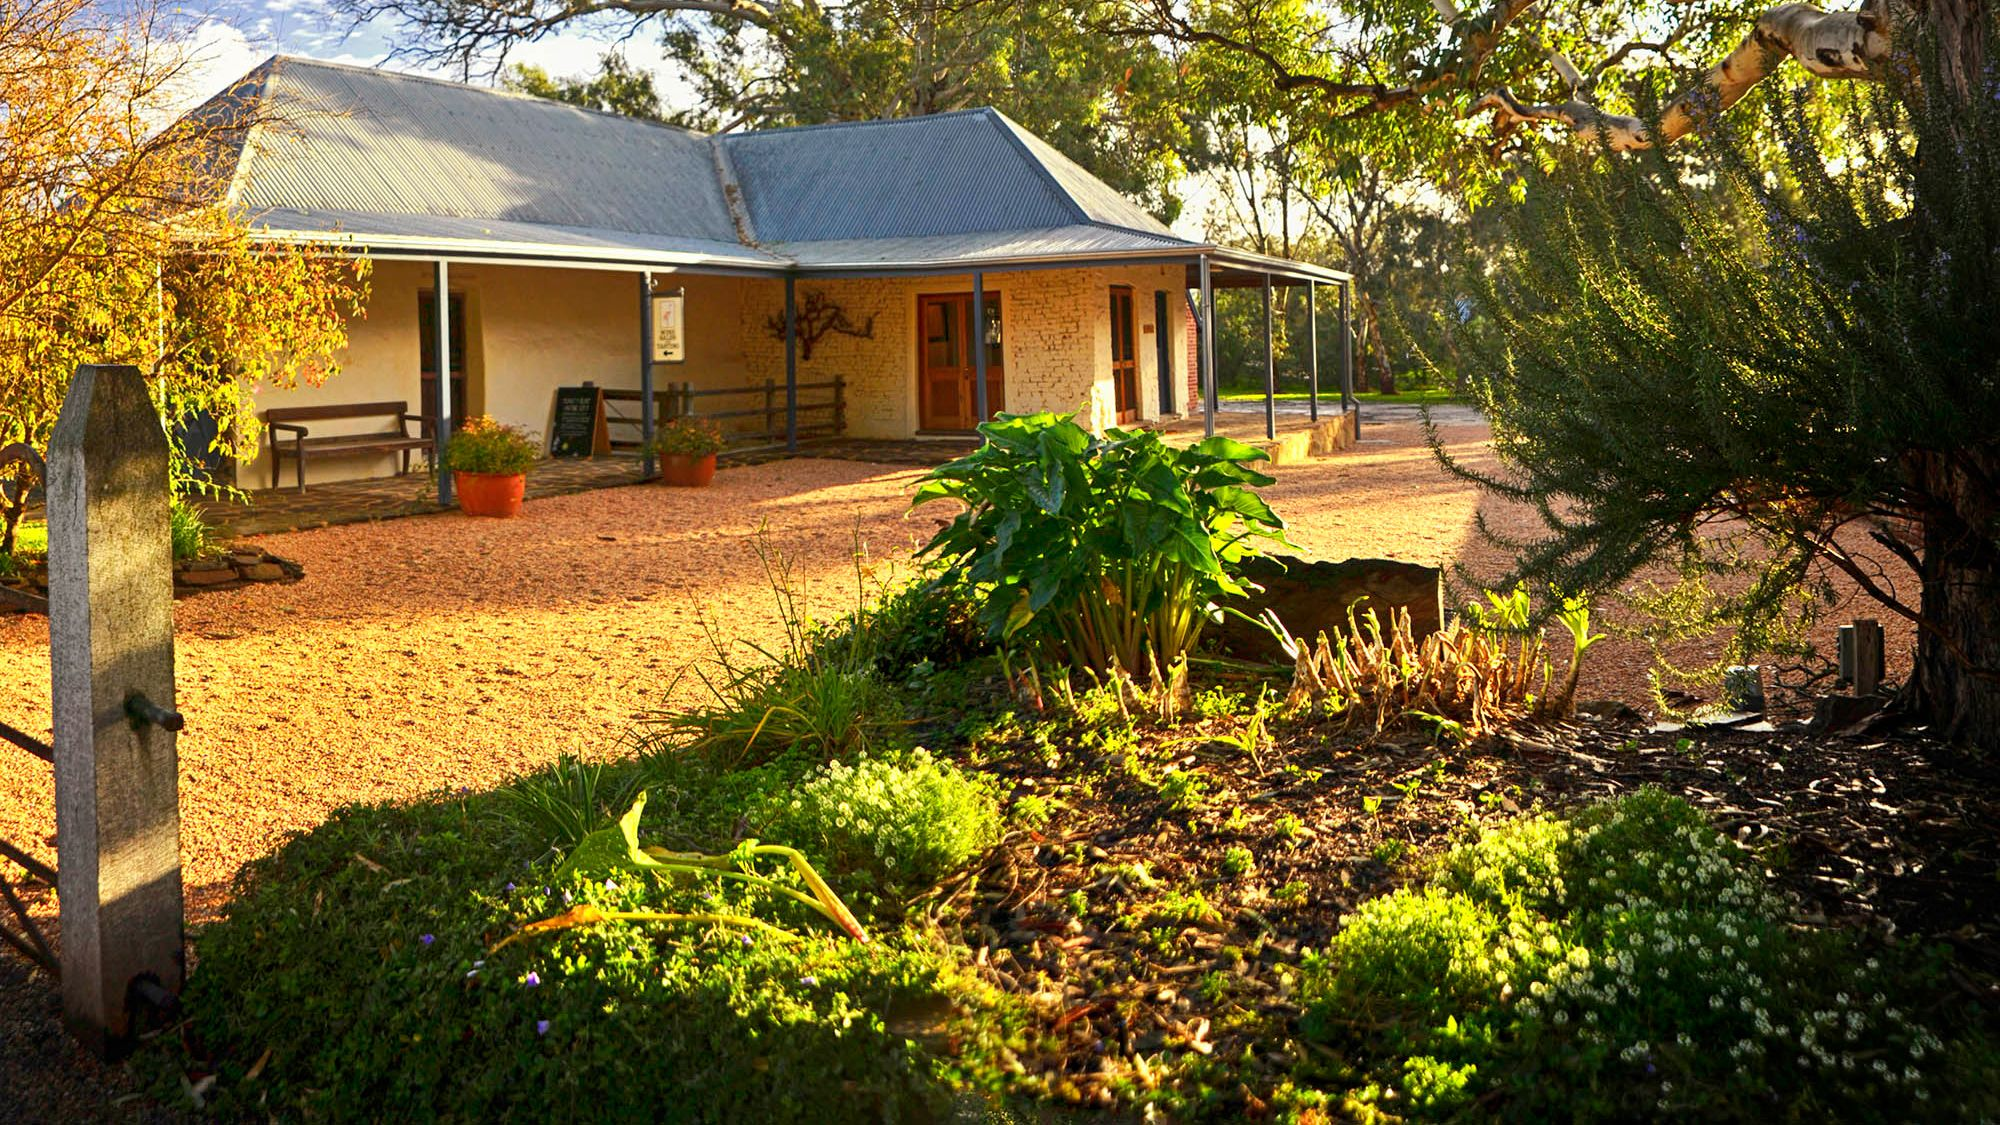 Building in Northern Barossa Valley in Australia.